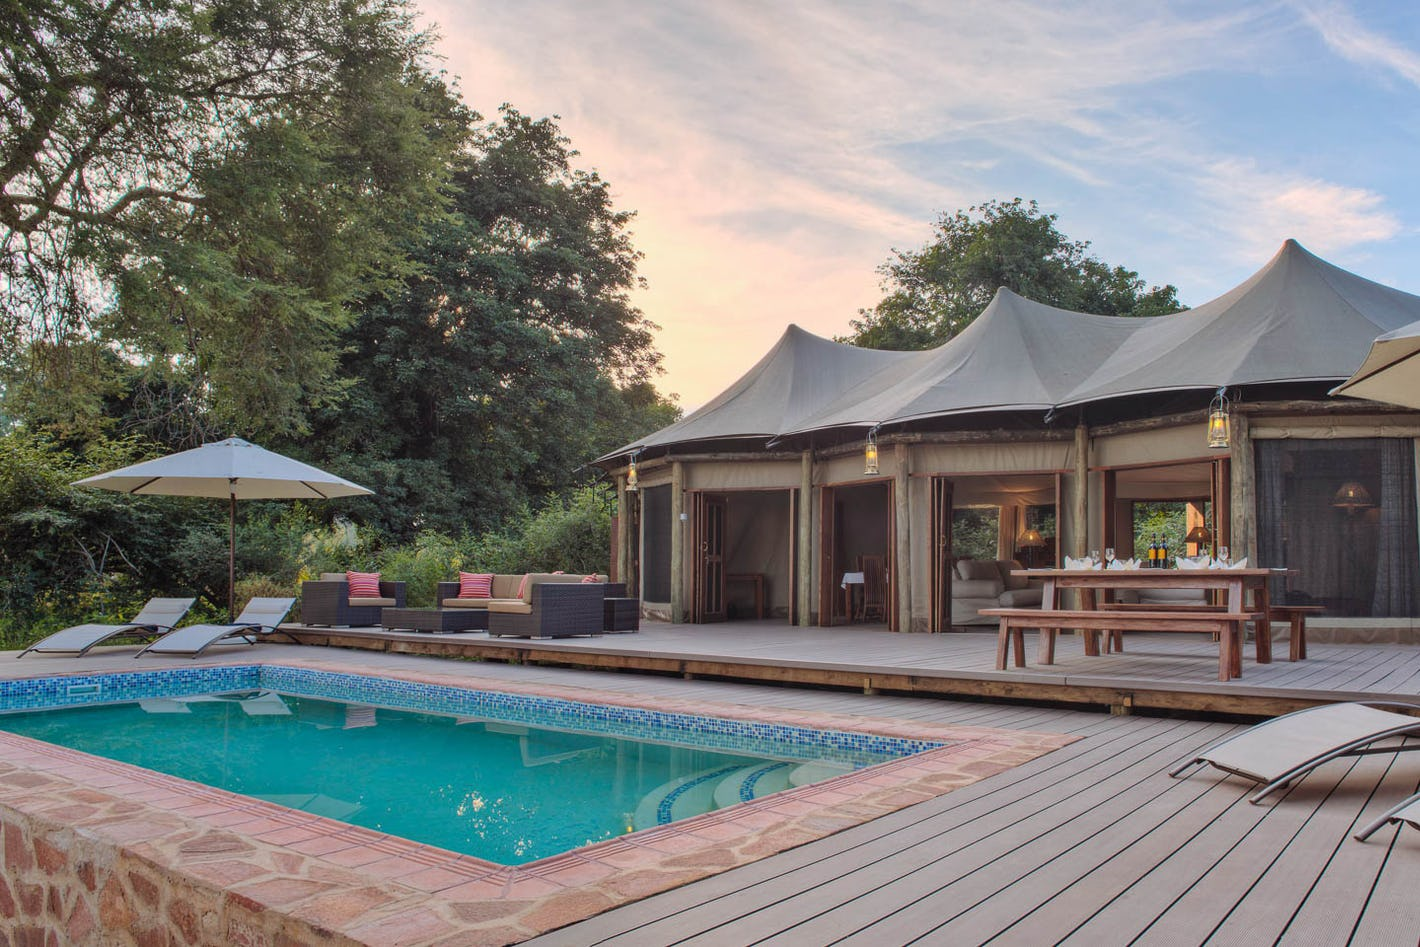 Design your zambia safari online timbuktu travel for Pool designs under 50 000